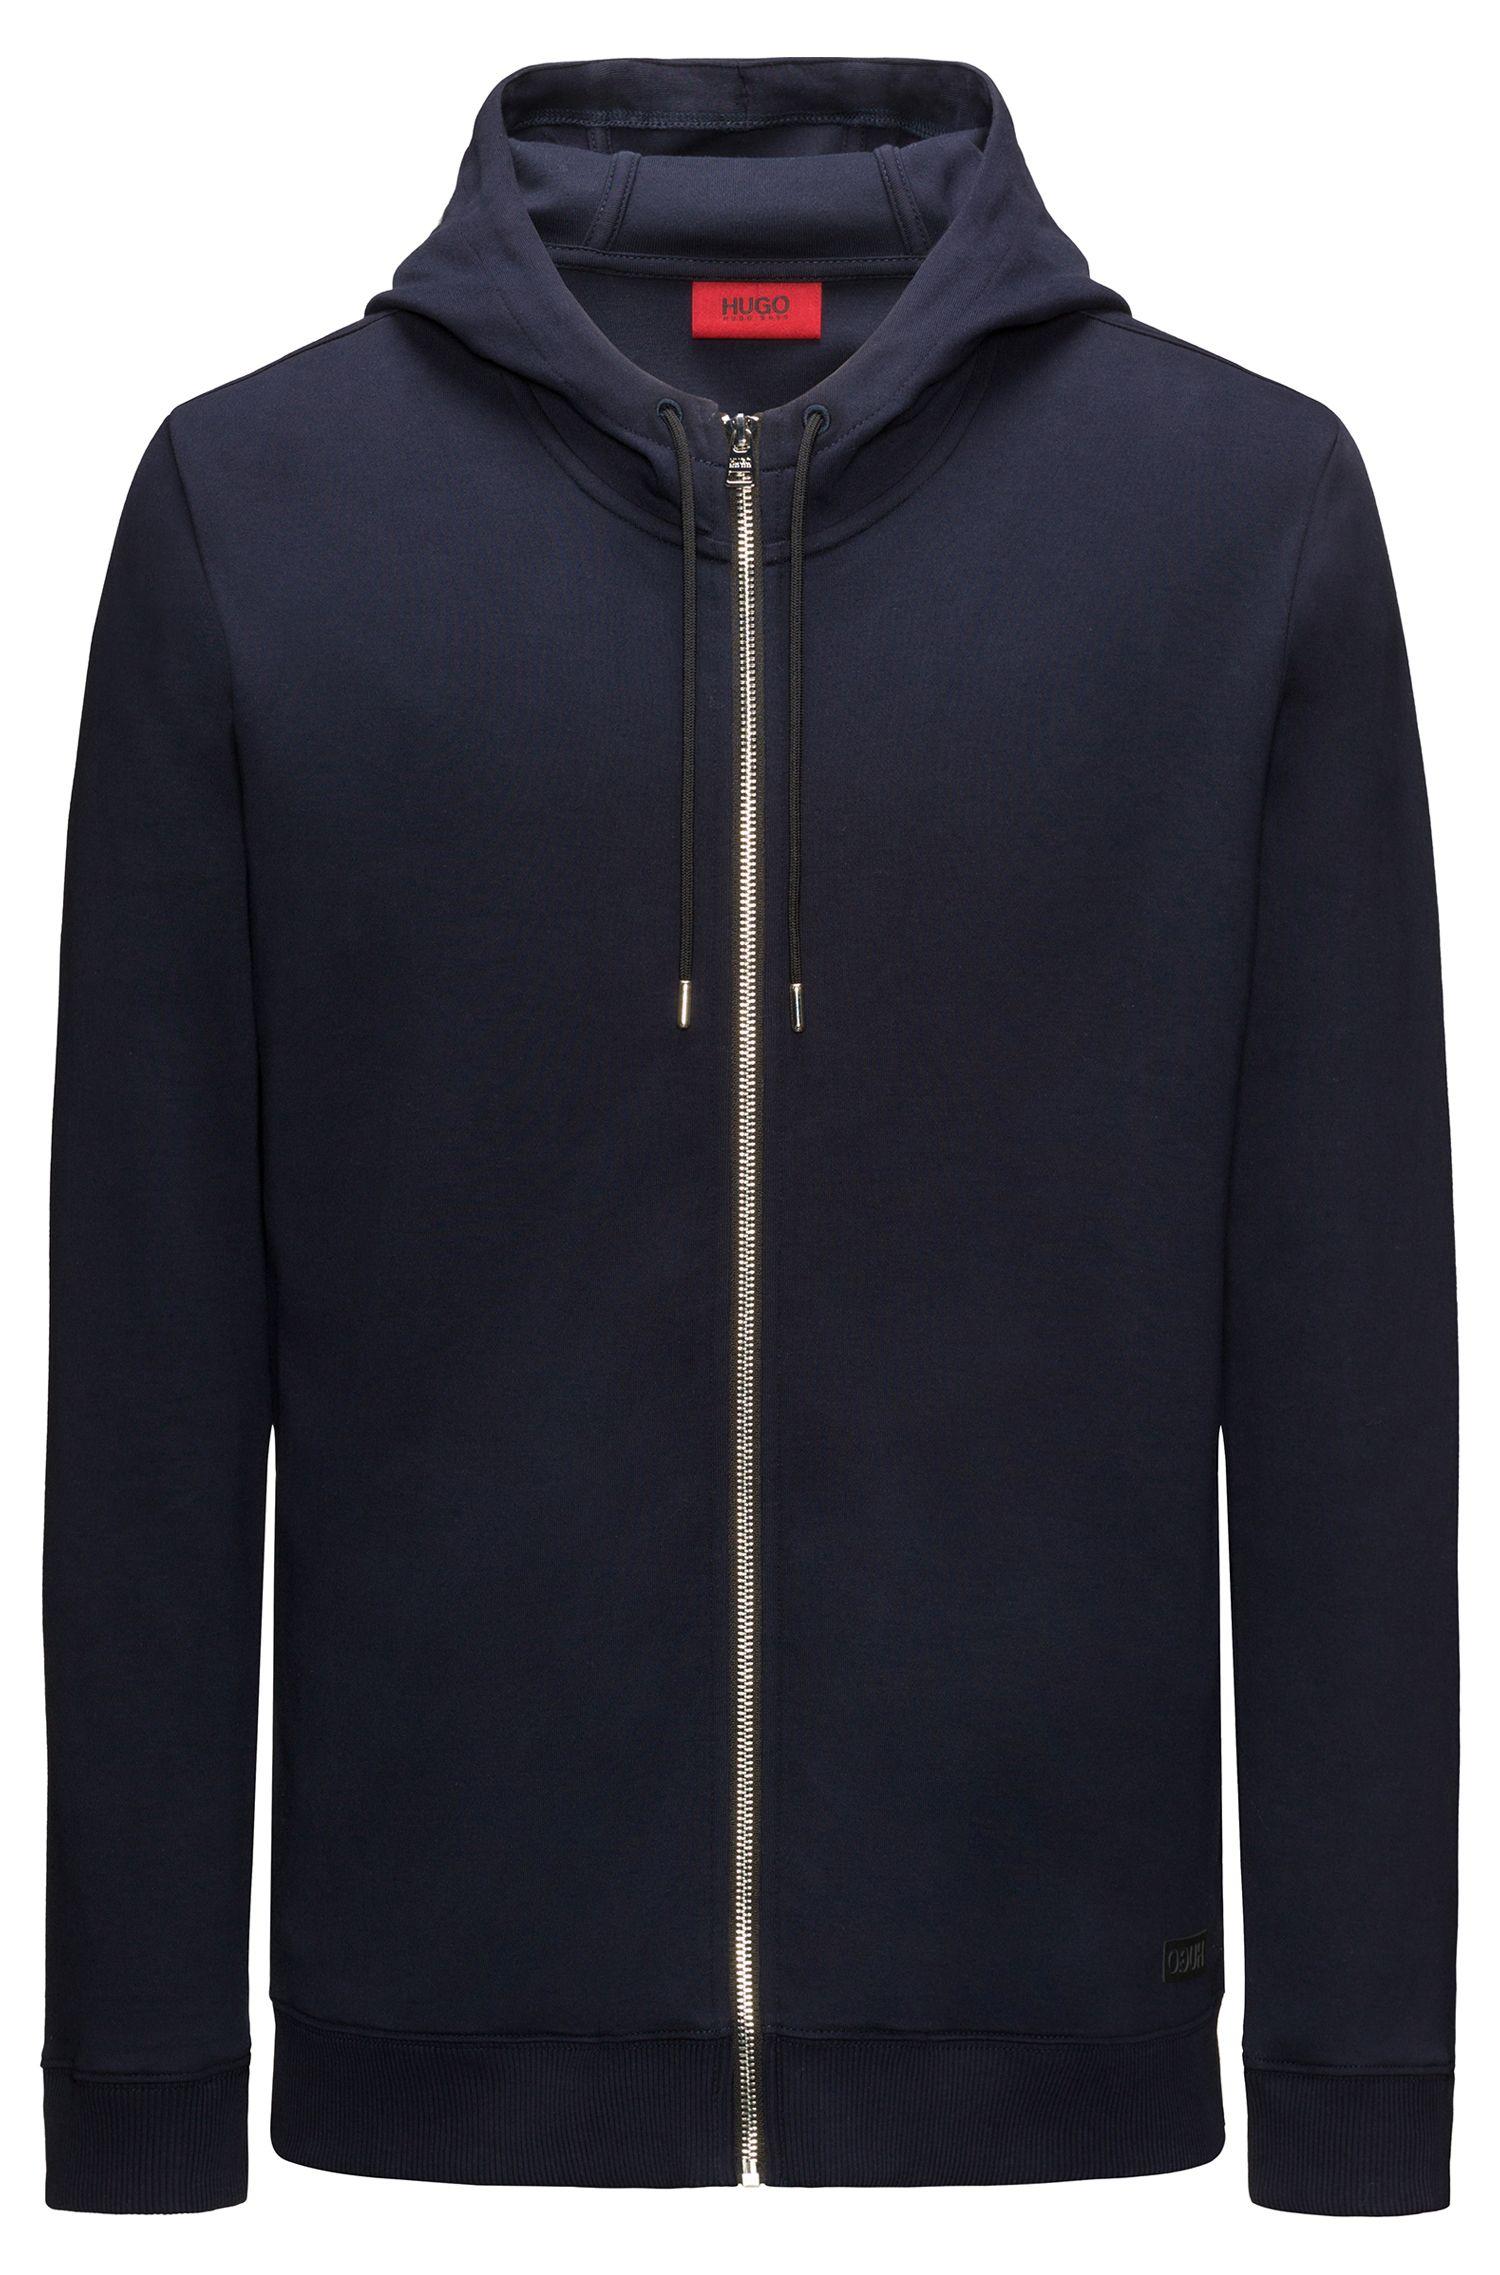 Zip-through hooded sweater in interlock cotton